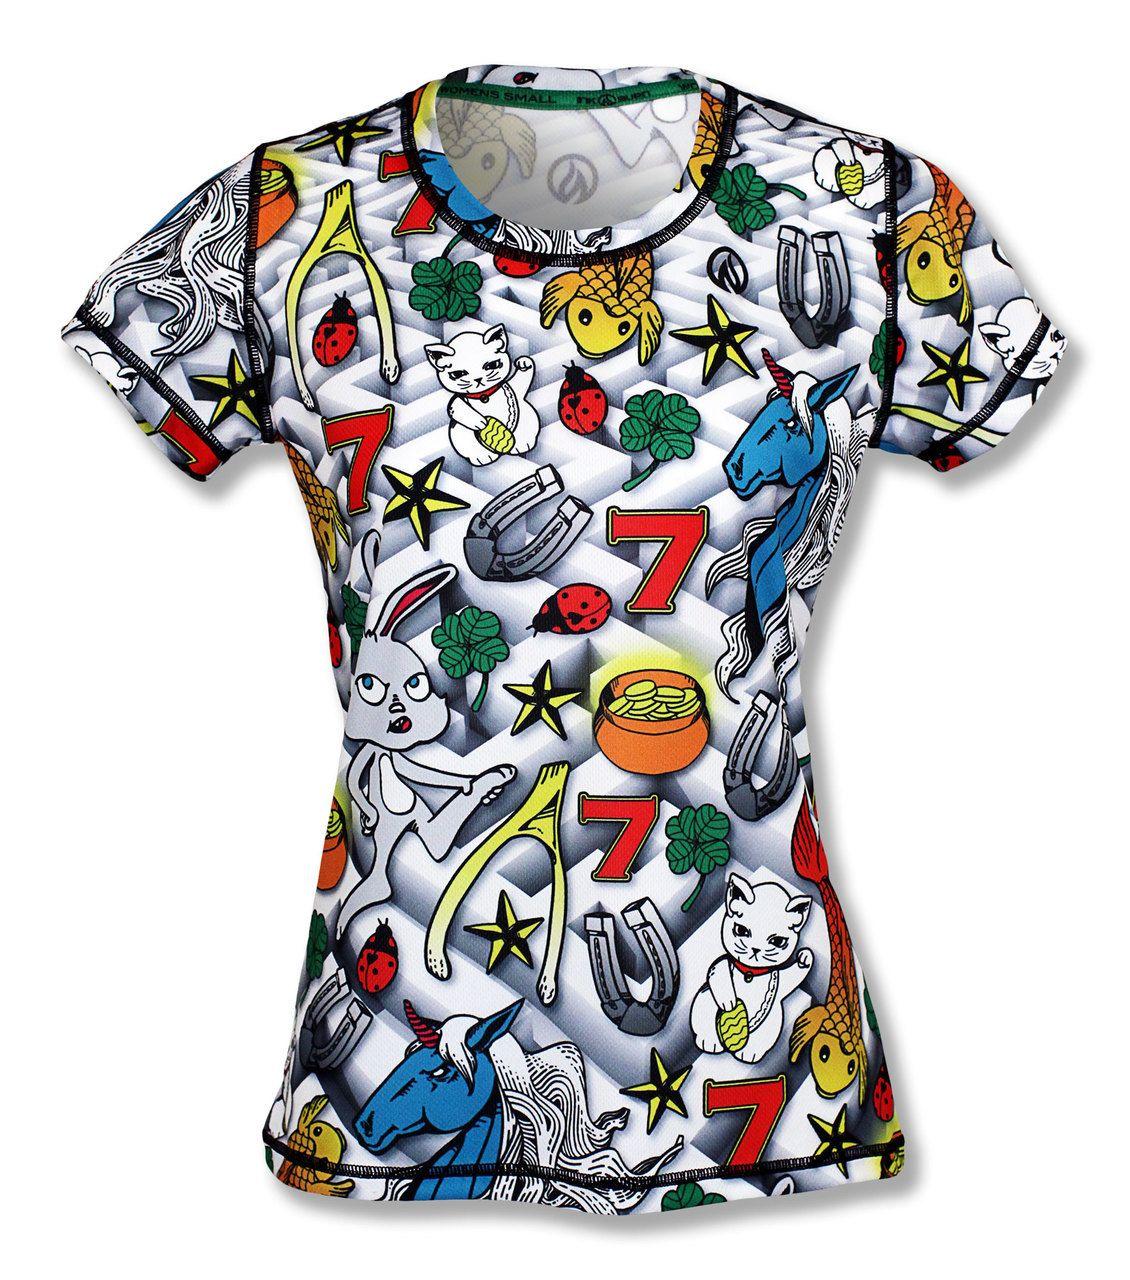 lustiges Angler T-Shirt Anglershirt Geburtstags Geschenk Angeln Motiv Fische 235